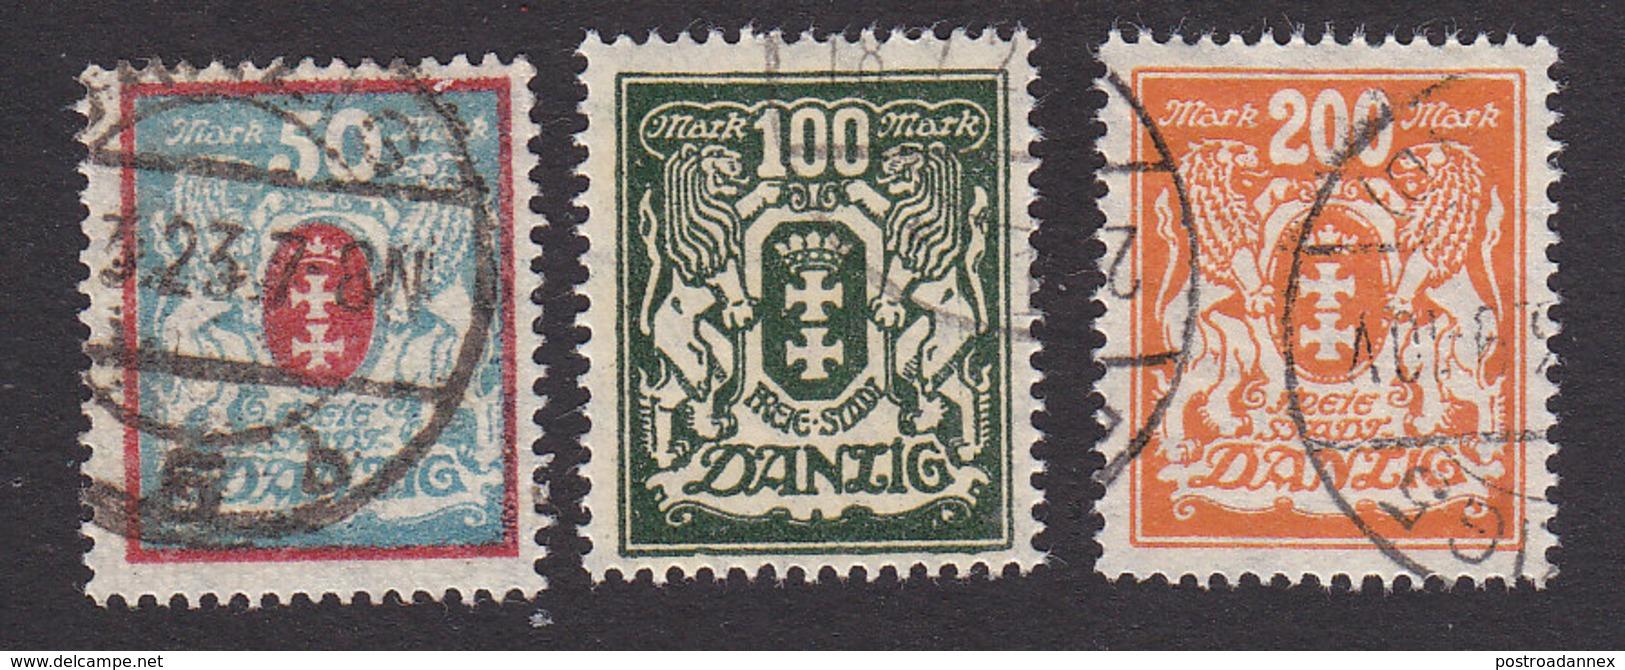 Danzig, Scott #106-107, 115, Used, Arms, Issued 1922 - Danzig